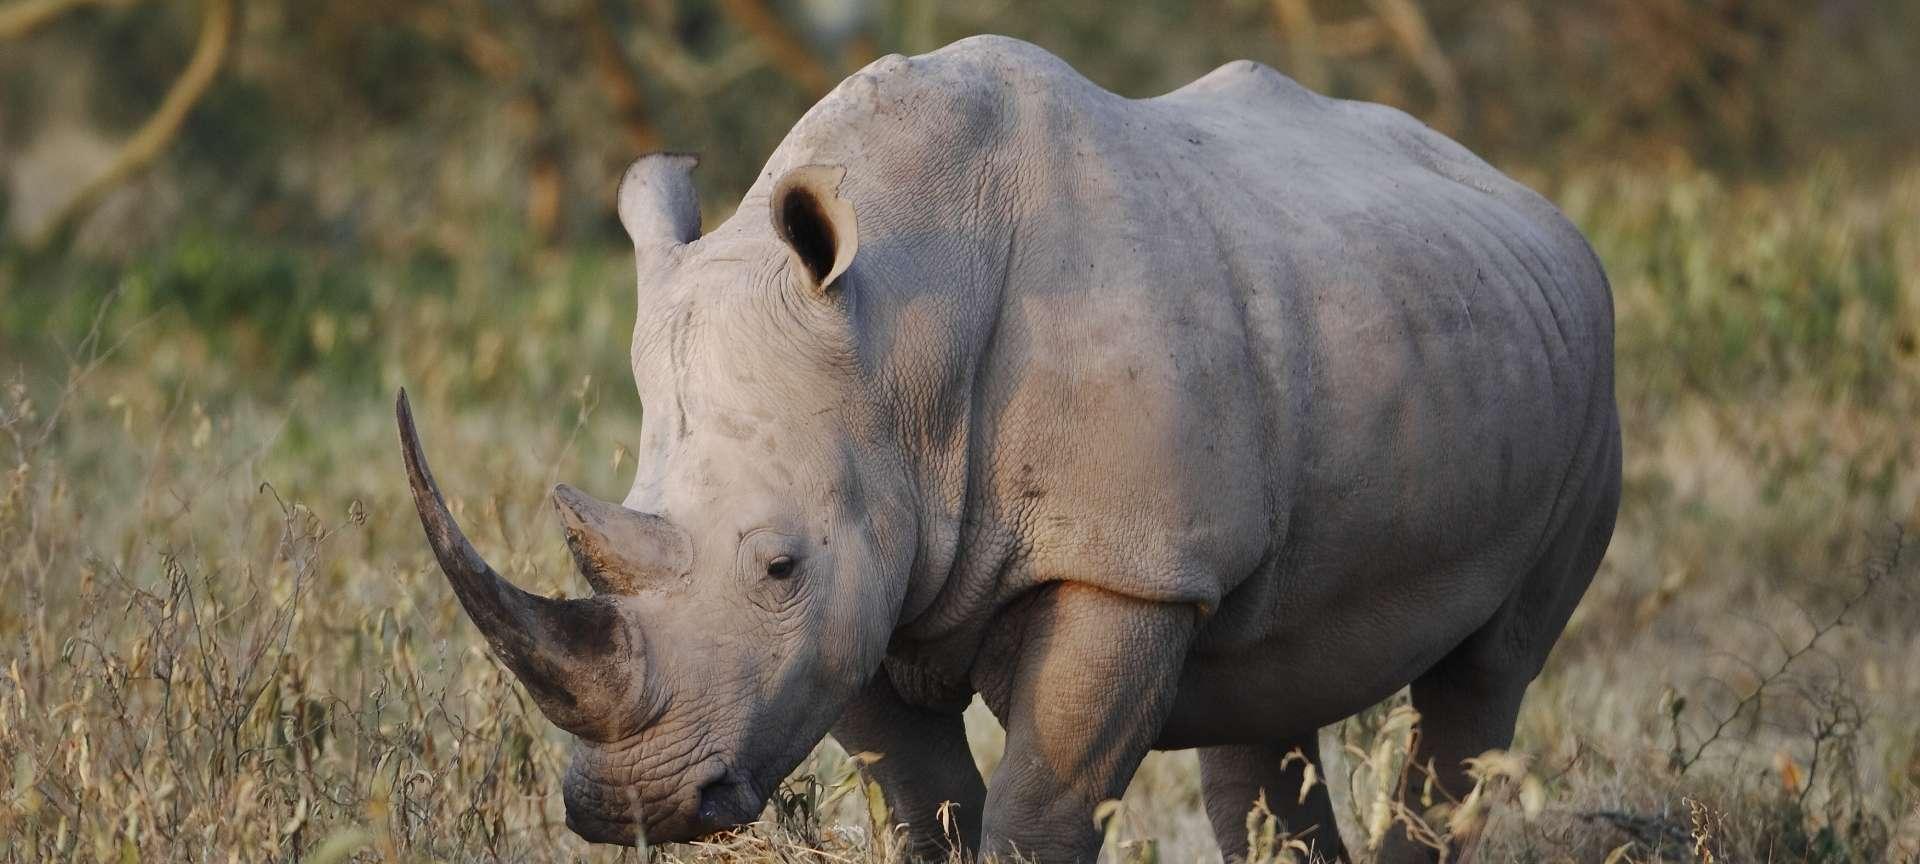 Rhino in the sweeping valley of Ngorongoro